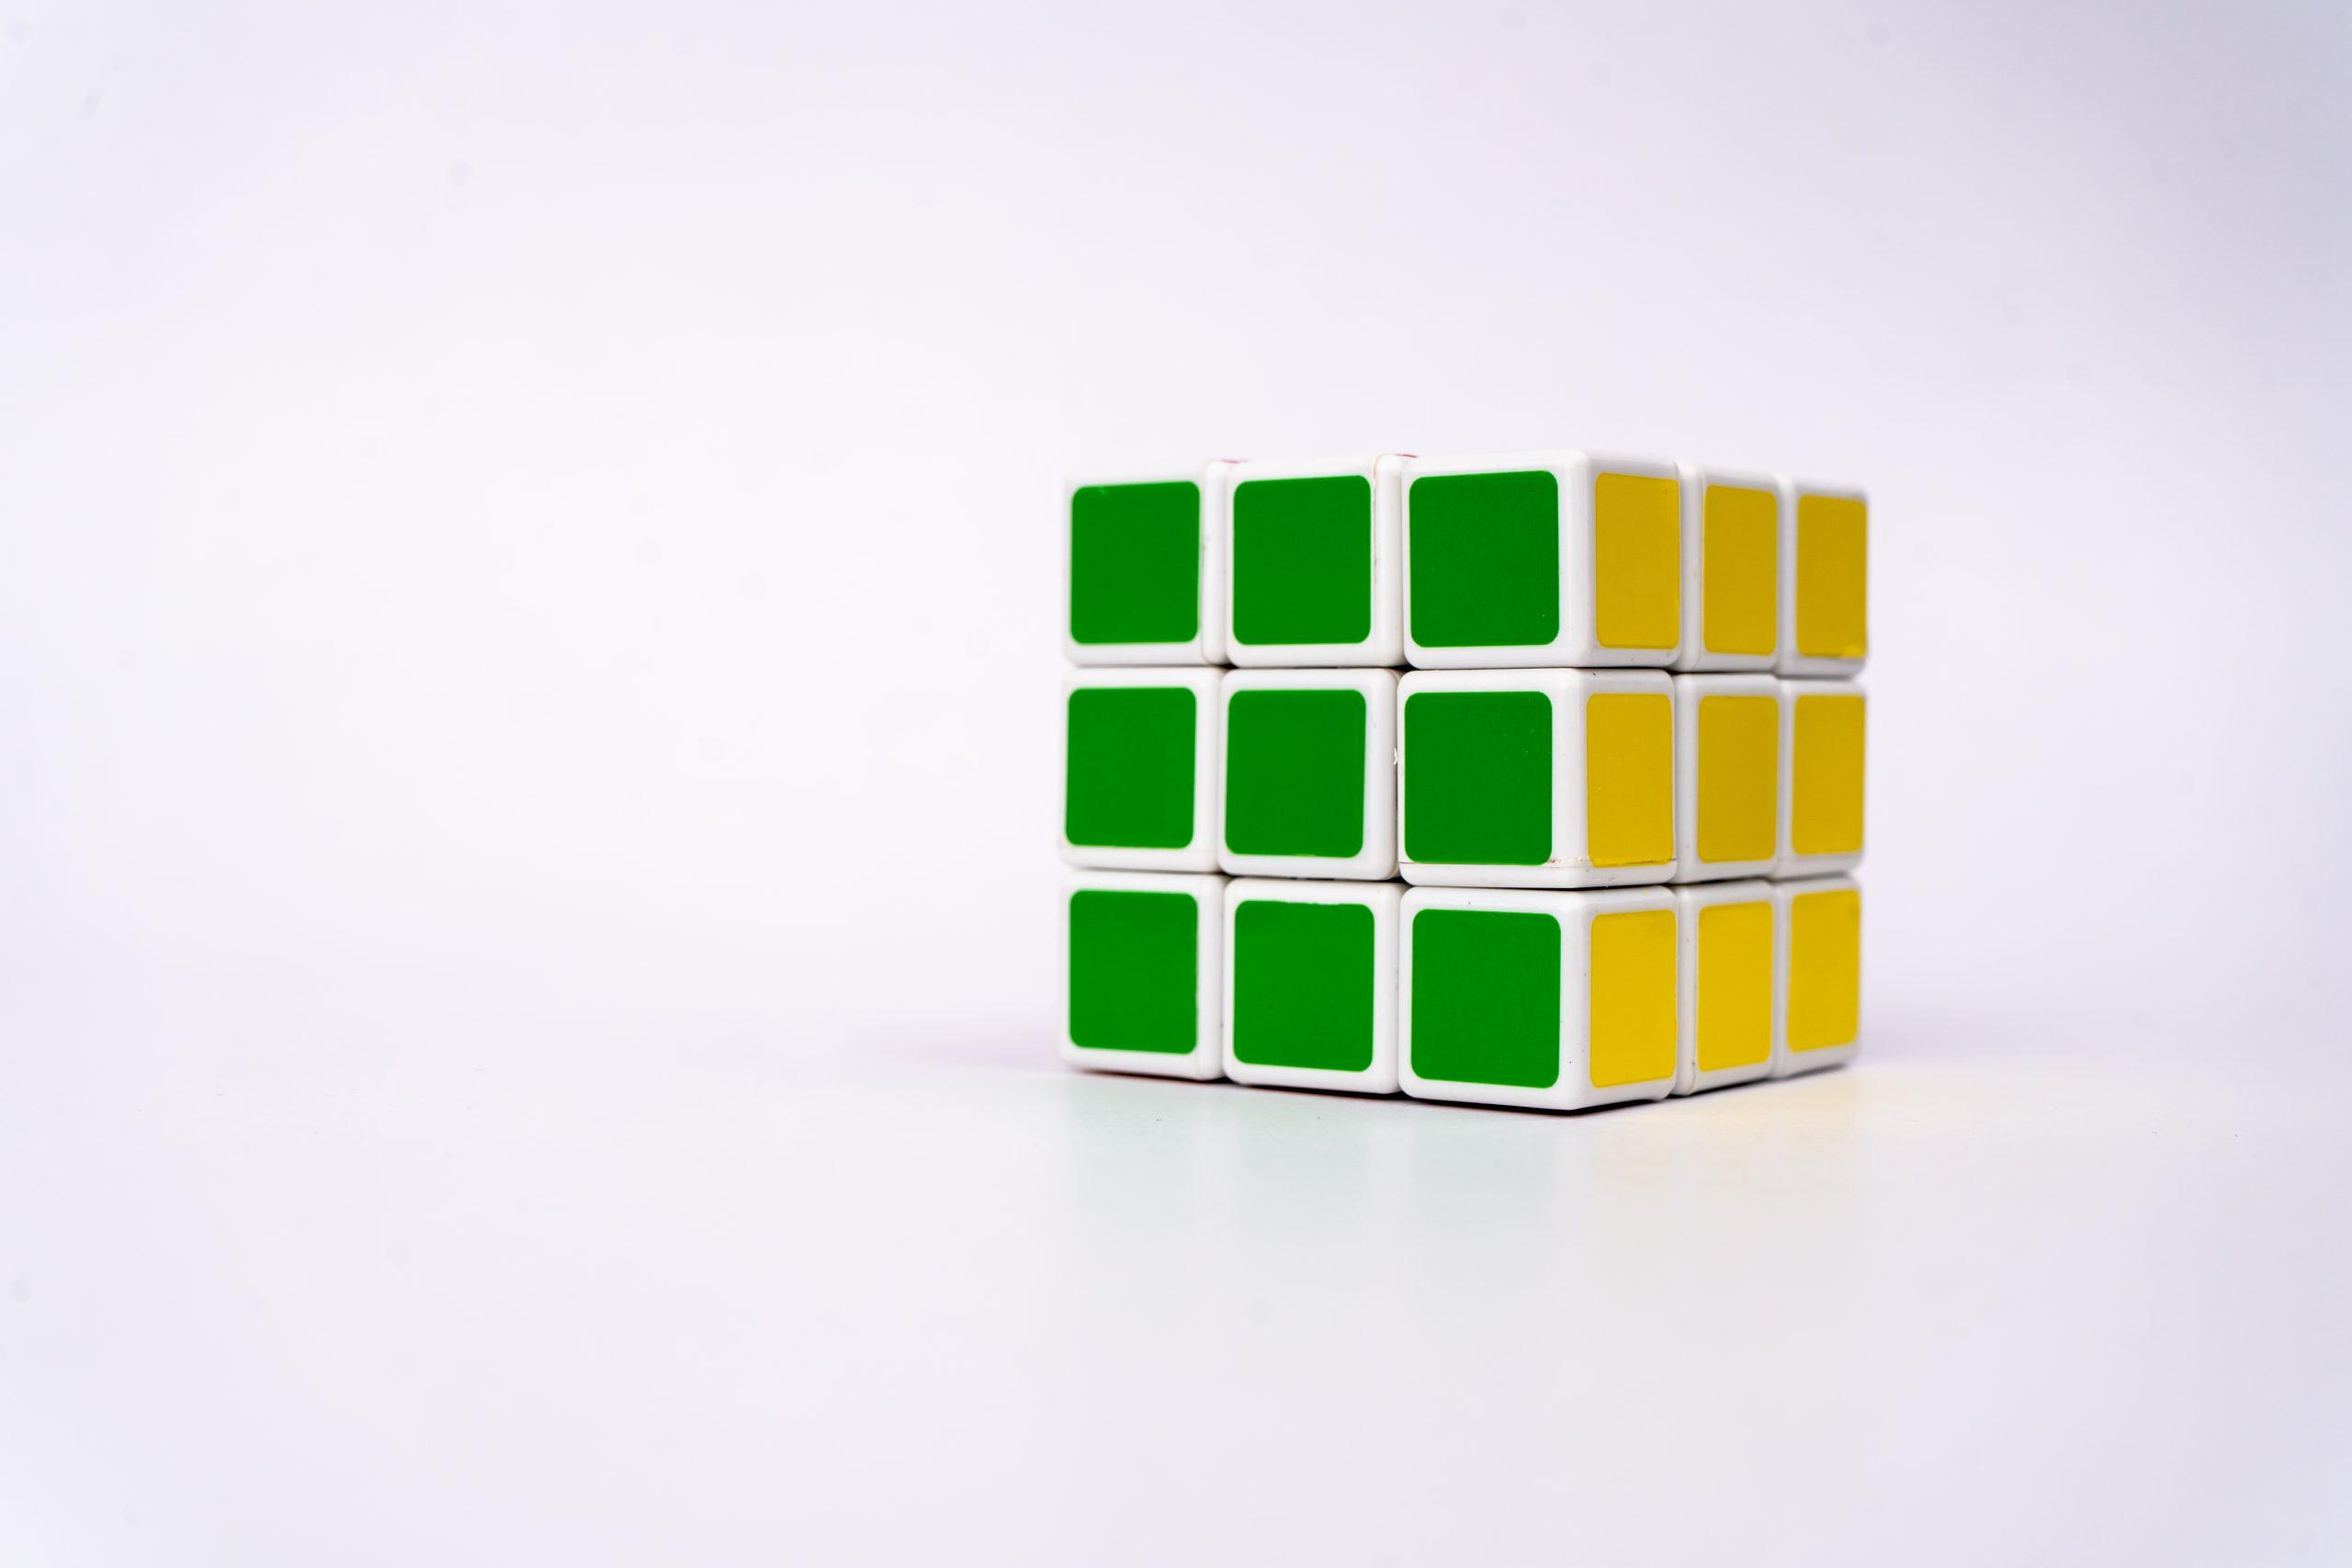 Rubik's cube side view